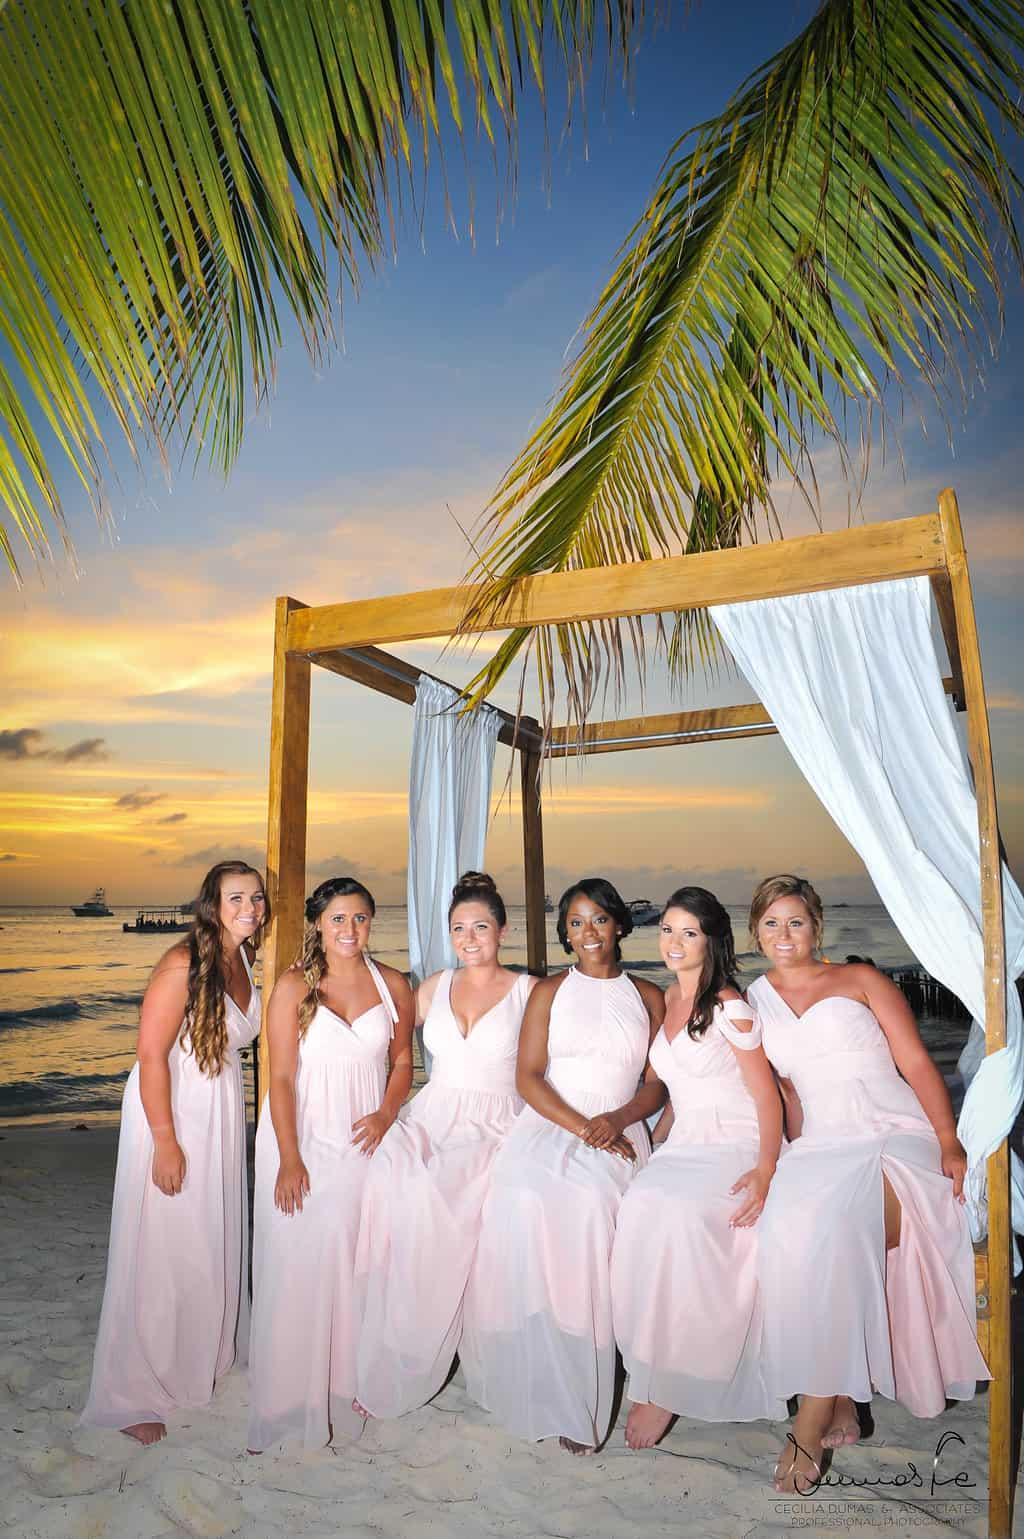 islamujeres-buhos-weddingphotography-giovannarosario85